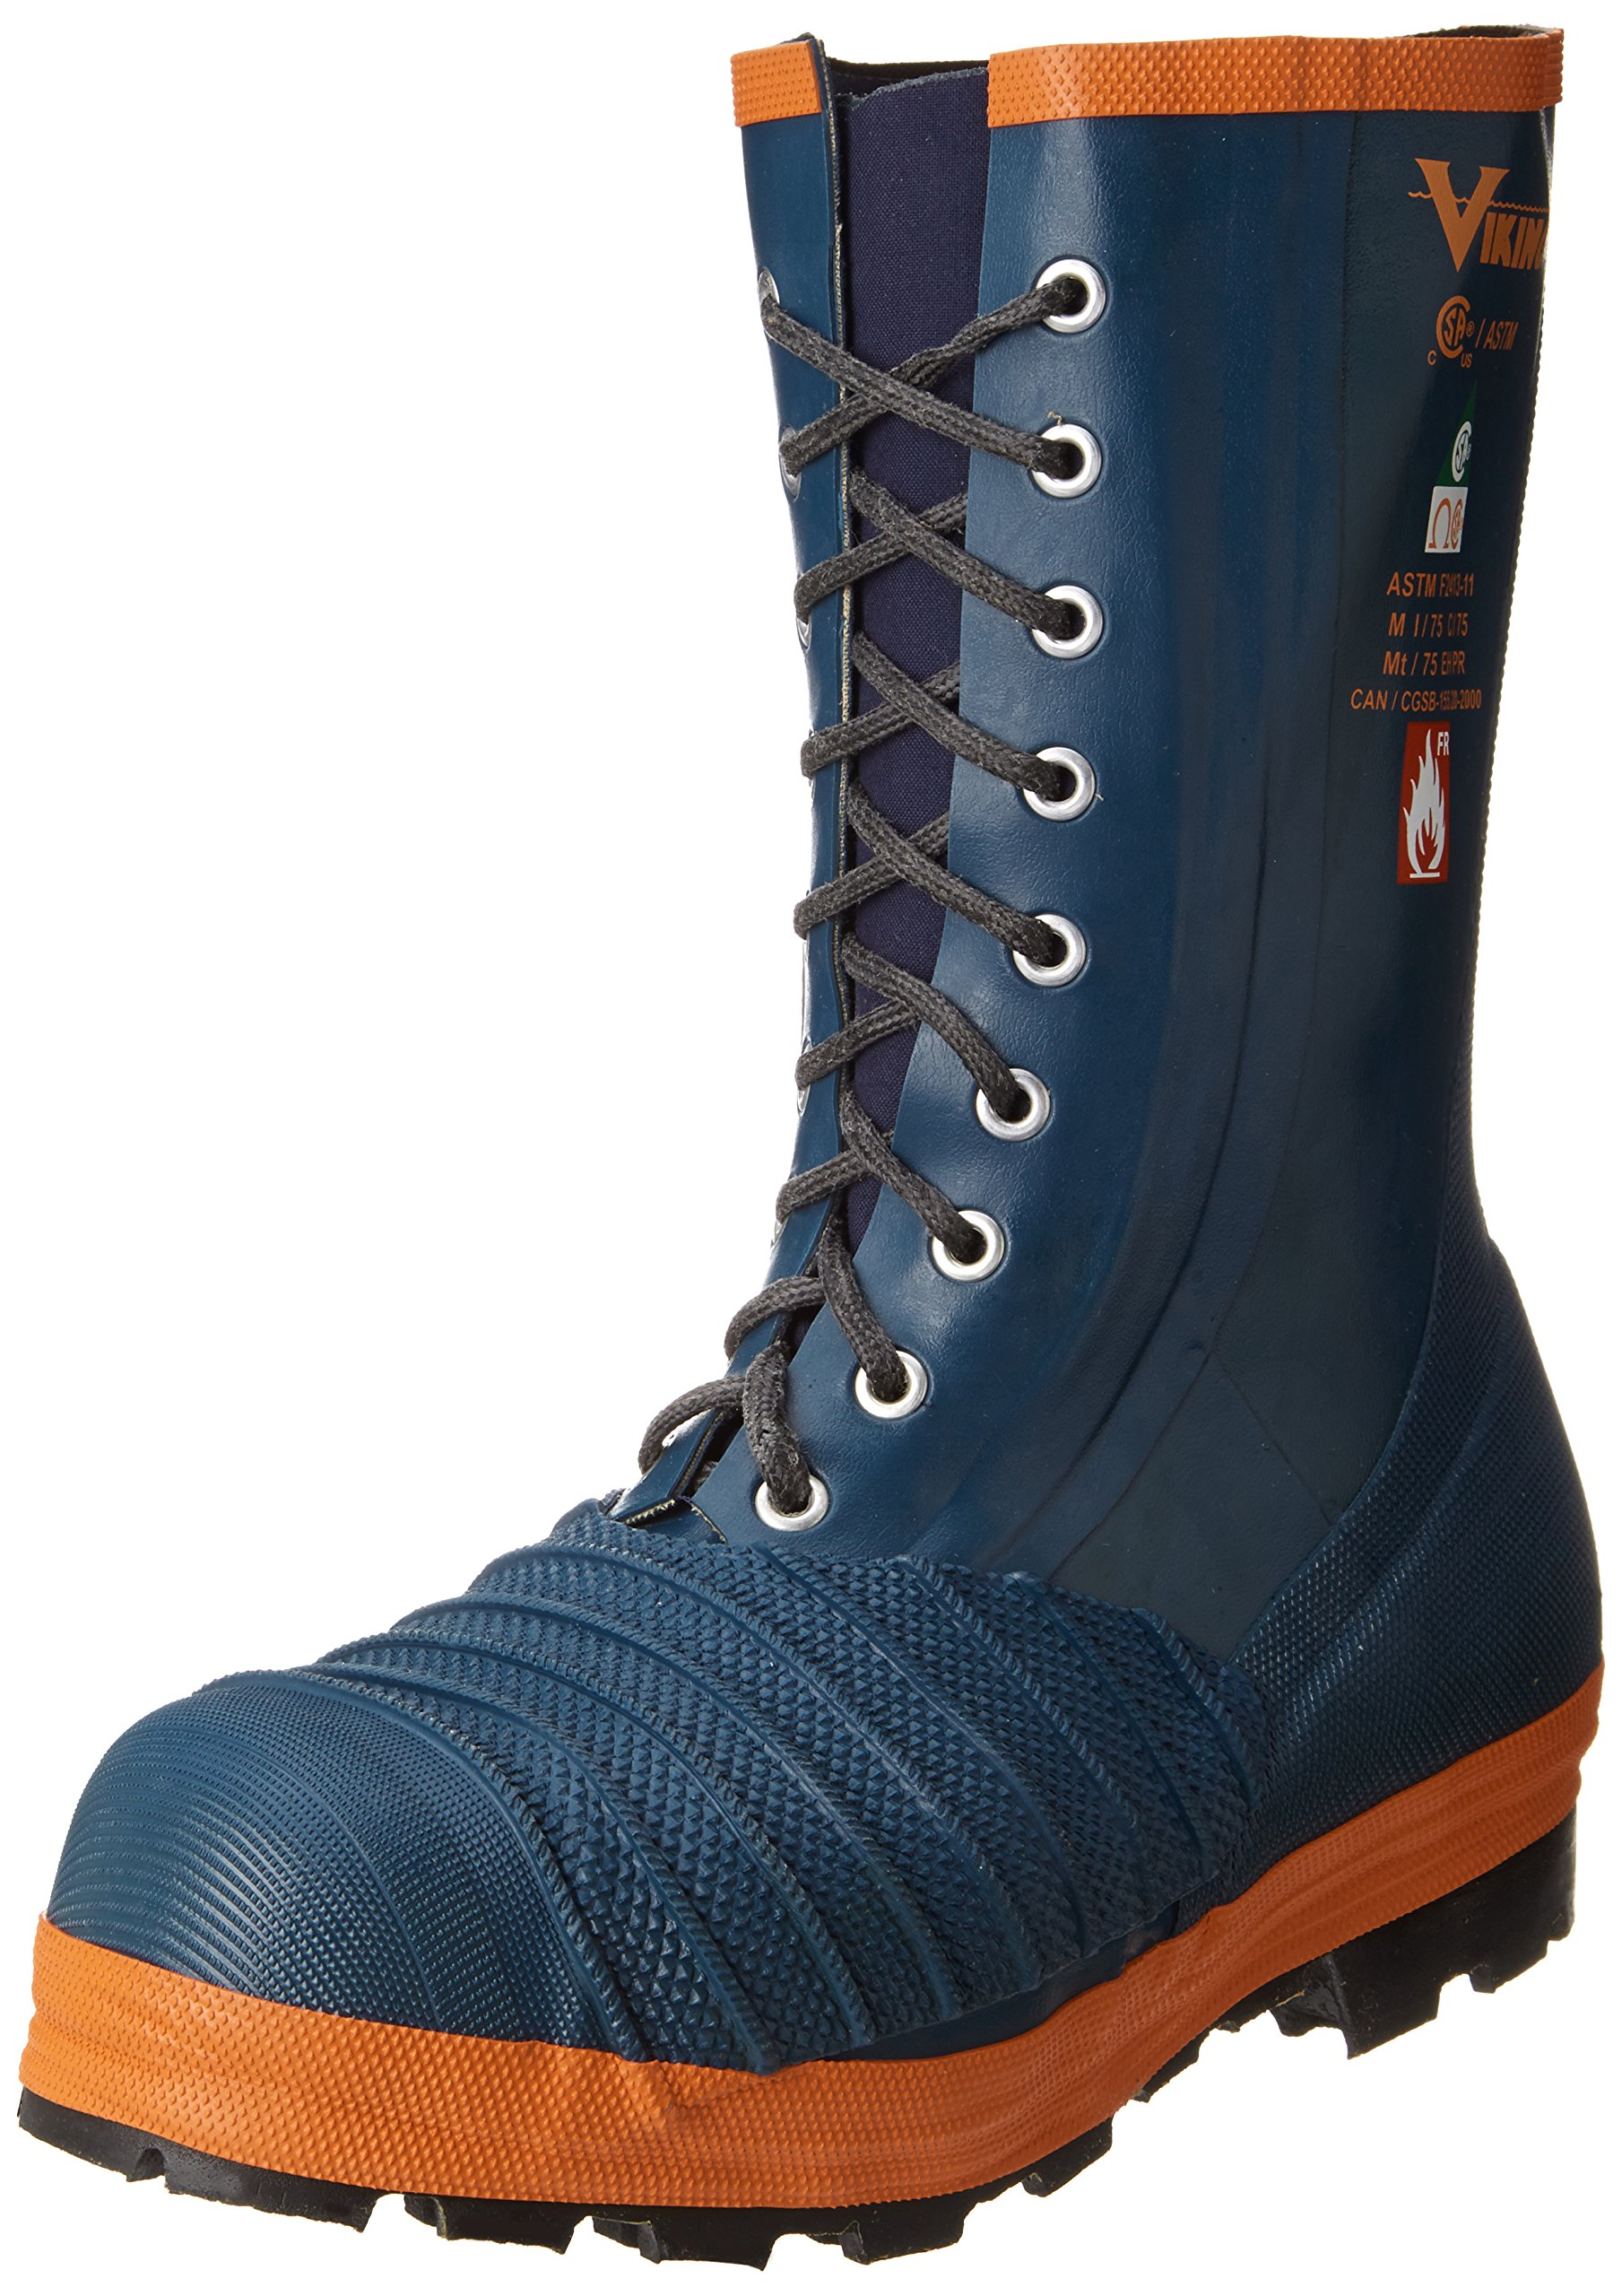 Viking Footwear Rigger Firewall FR-S/T&P Fire Resistant Boot, Blue/Orange, 9 M US by Viking Footwear